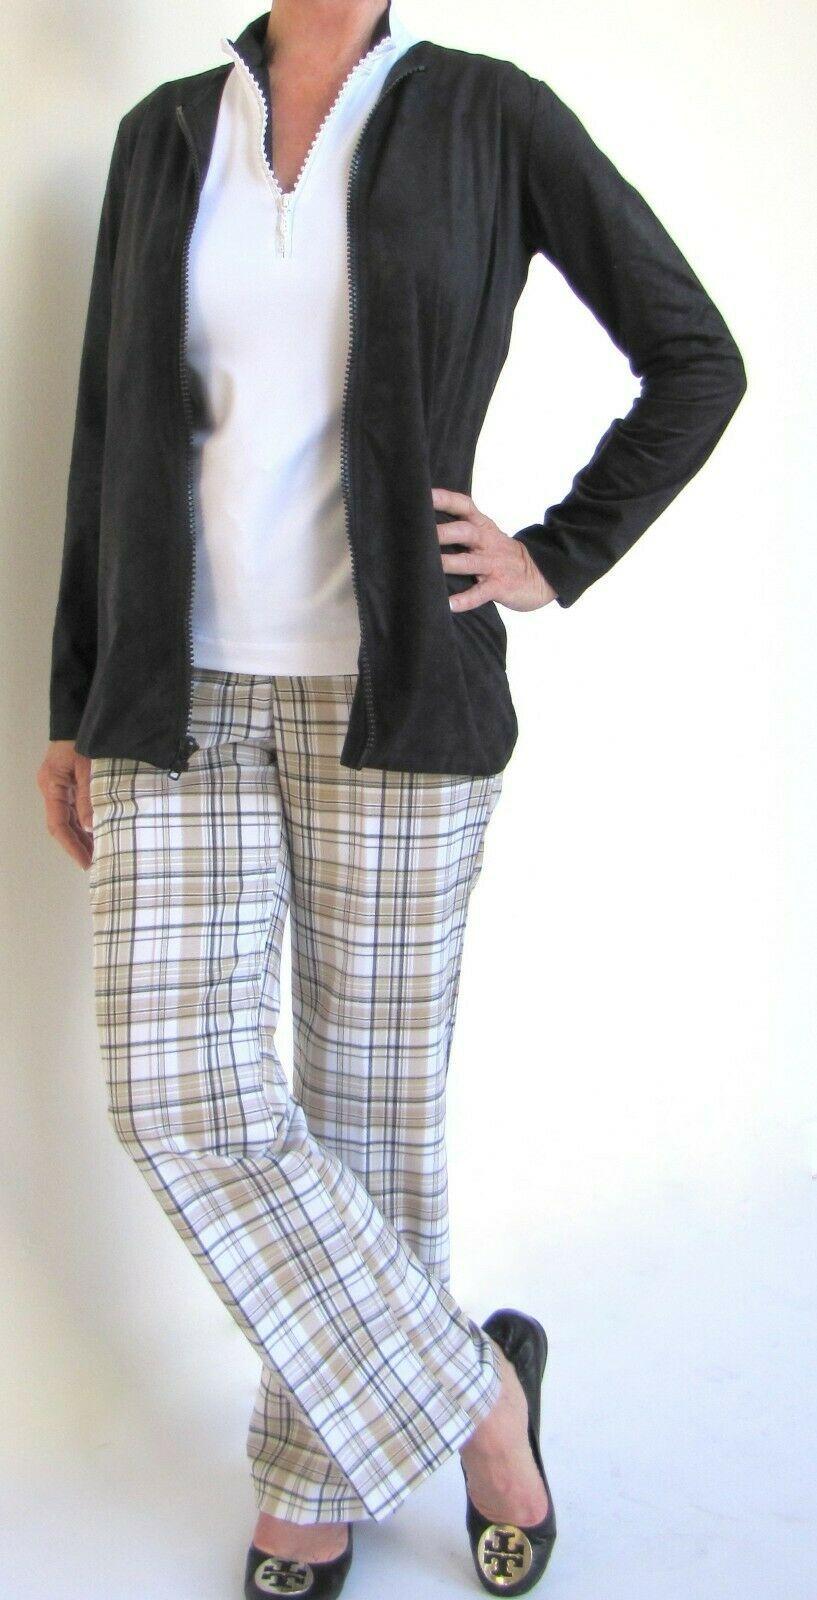 Stylish Women's Golf & Casual Tan Short Sleeve Collar Top, Swarovski Buttons  image 7